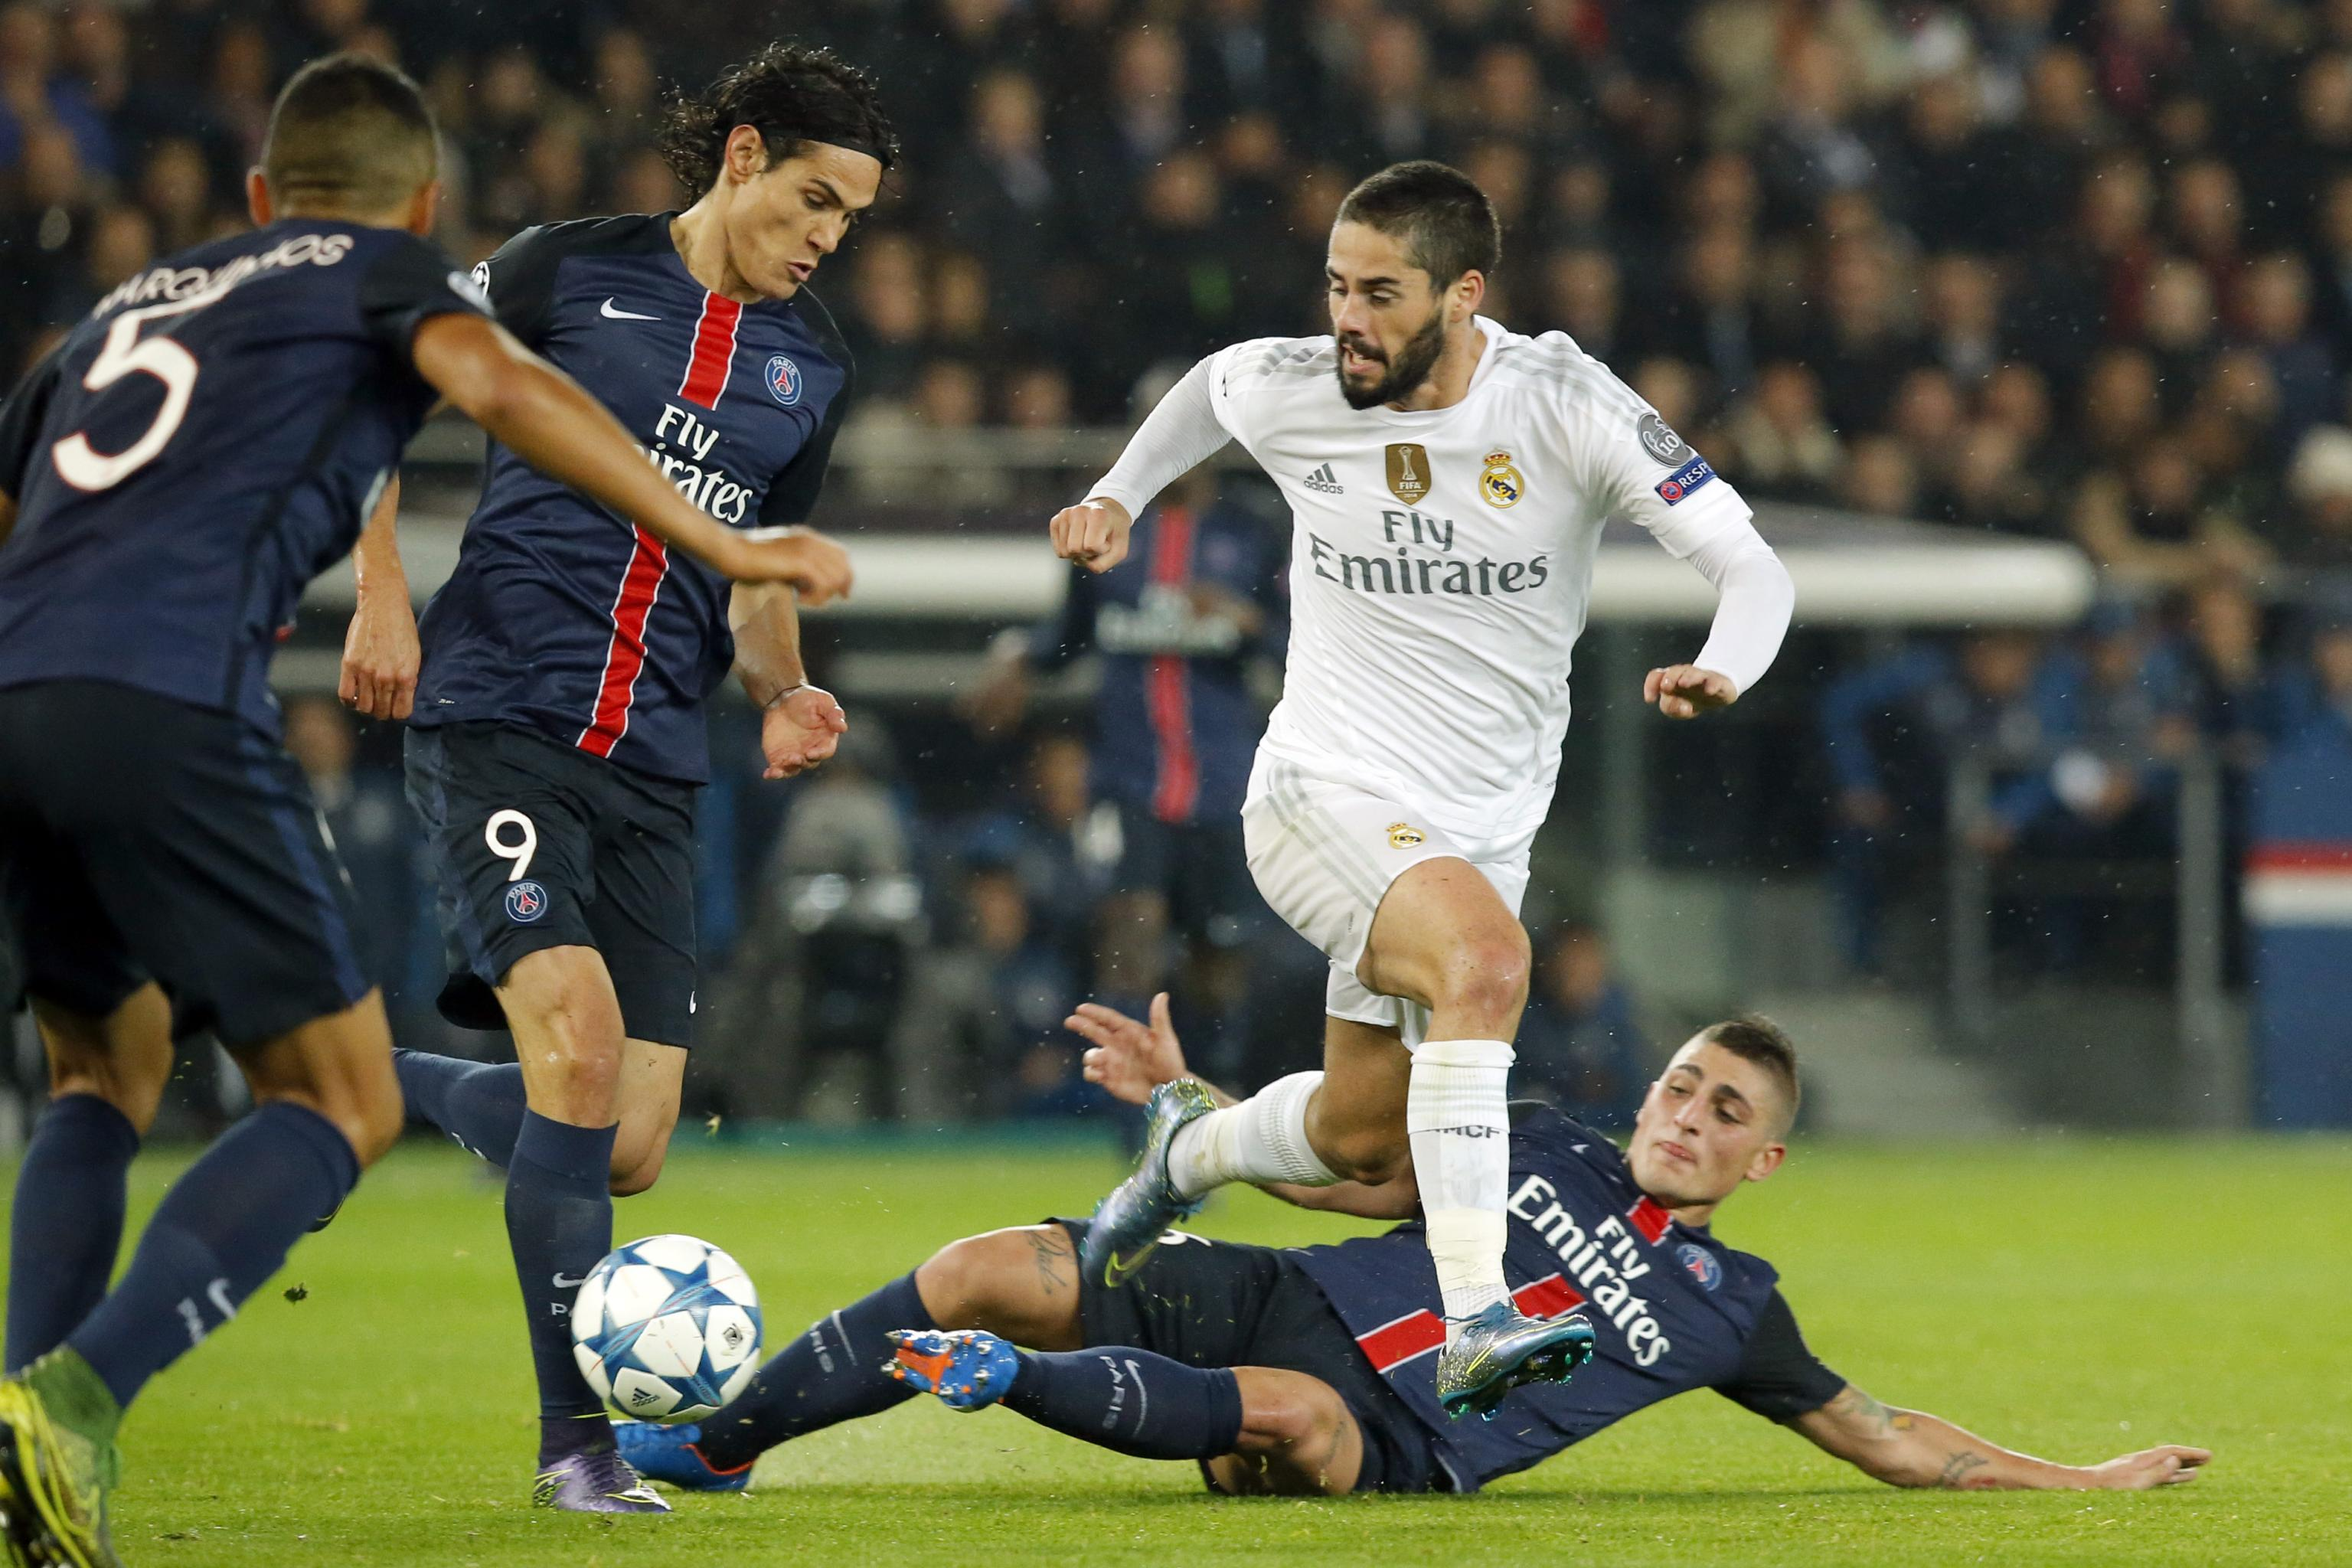 Soi kèo Levante vs Real Madrid